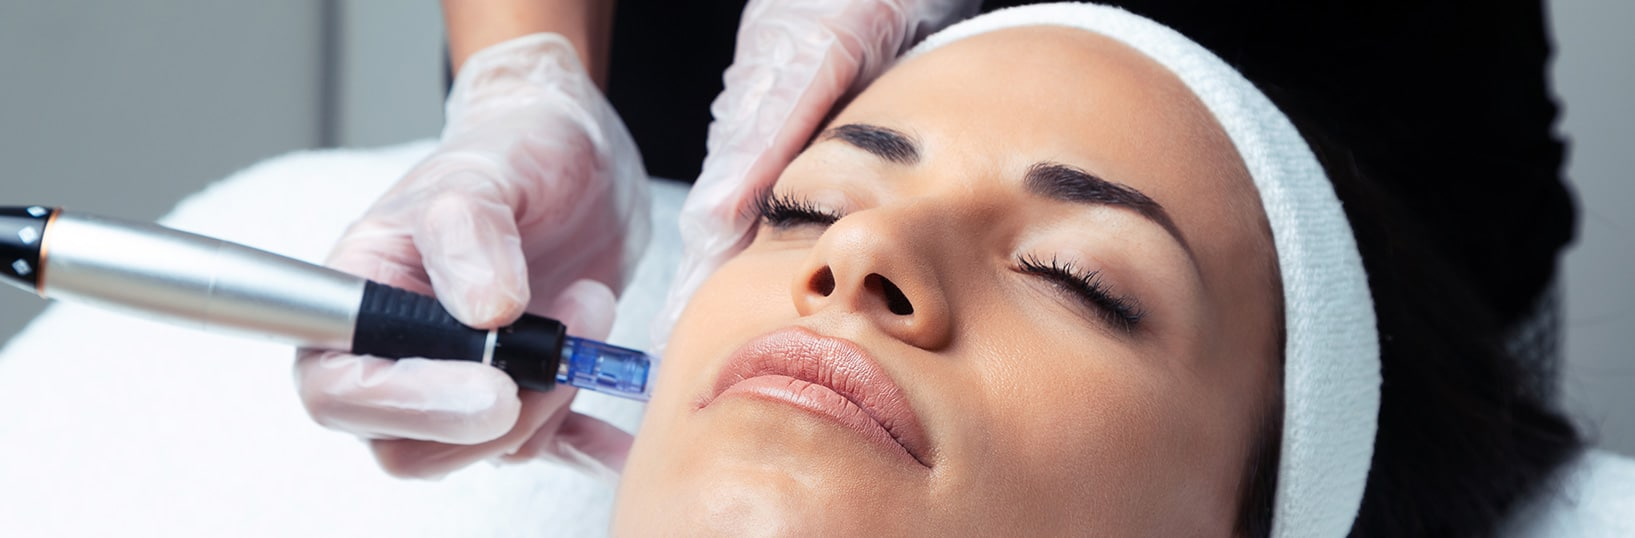 Microneedling Beauty Treatment